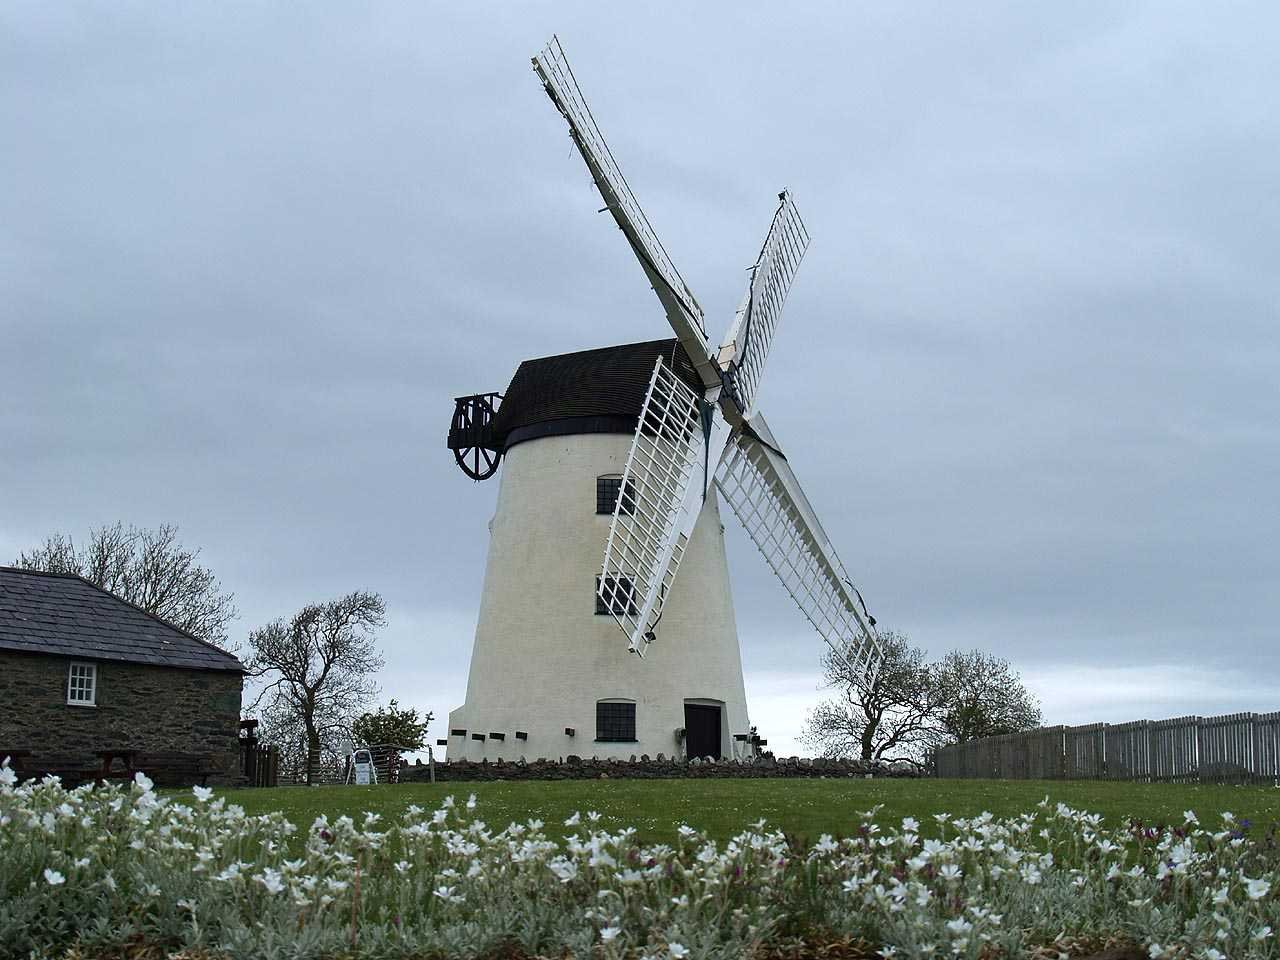 Anglesey, Llanddeusant, Llynnon Mill